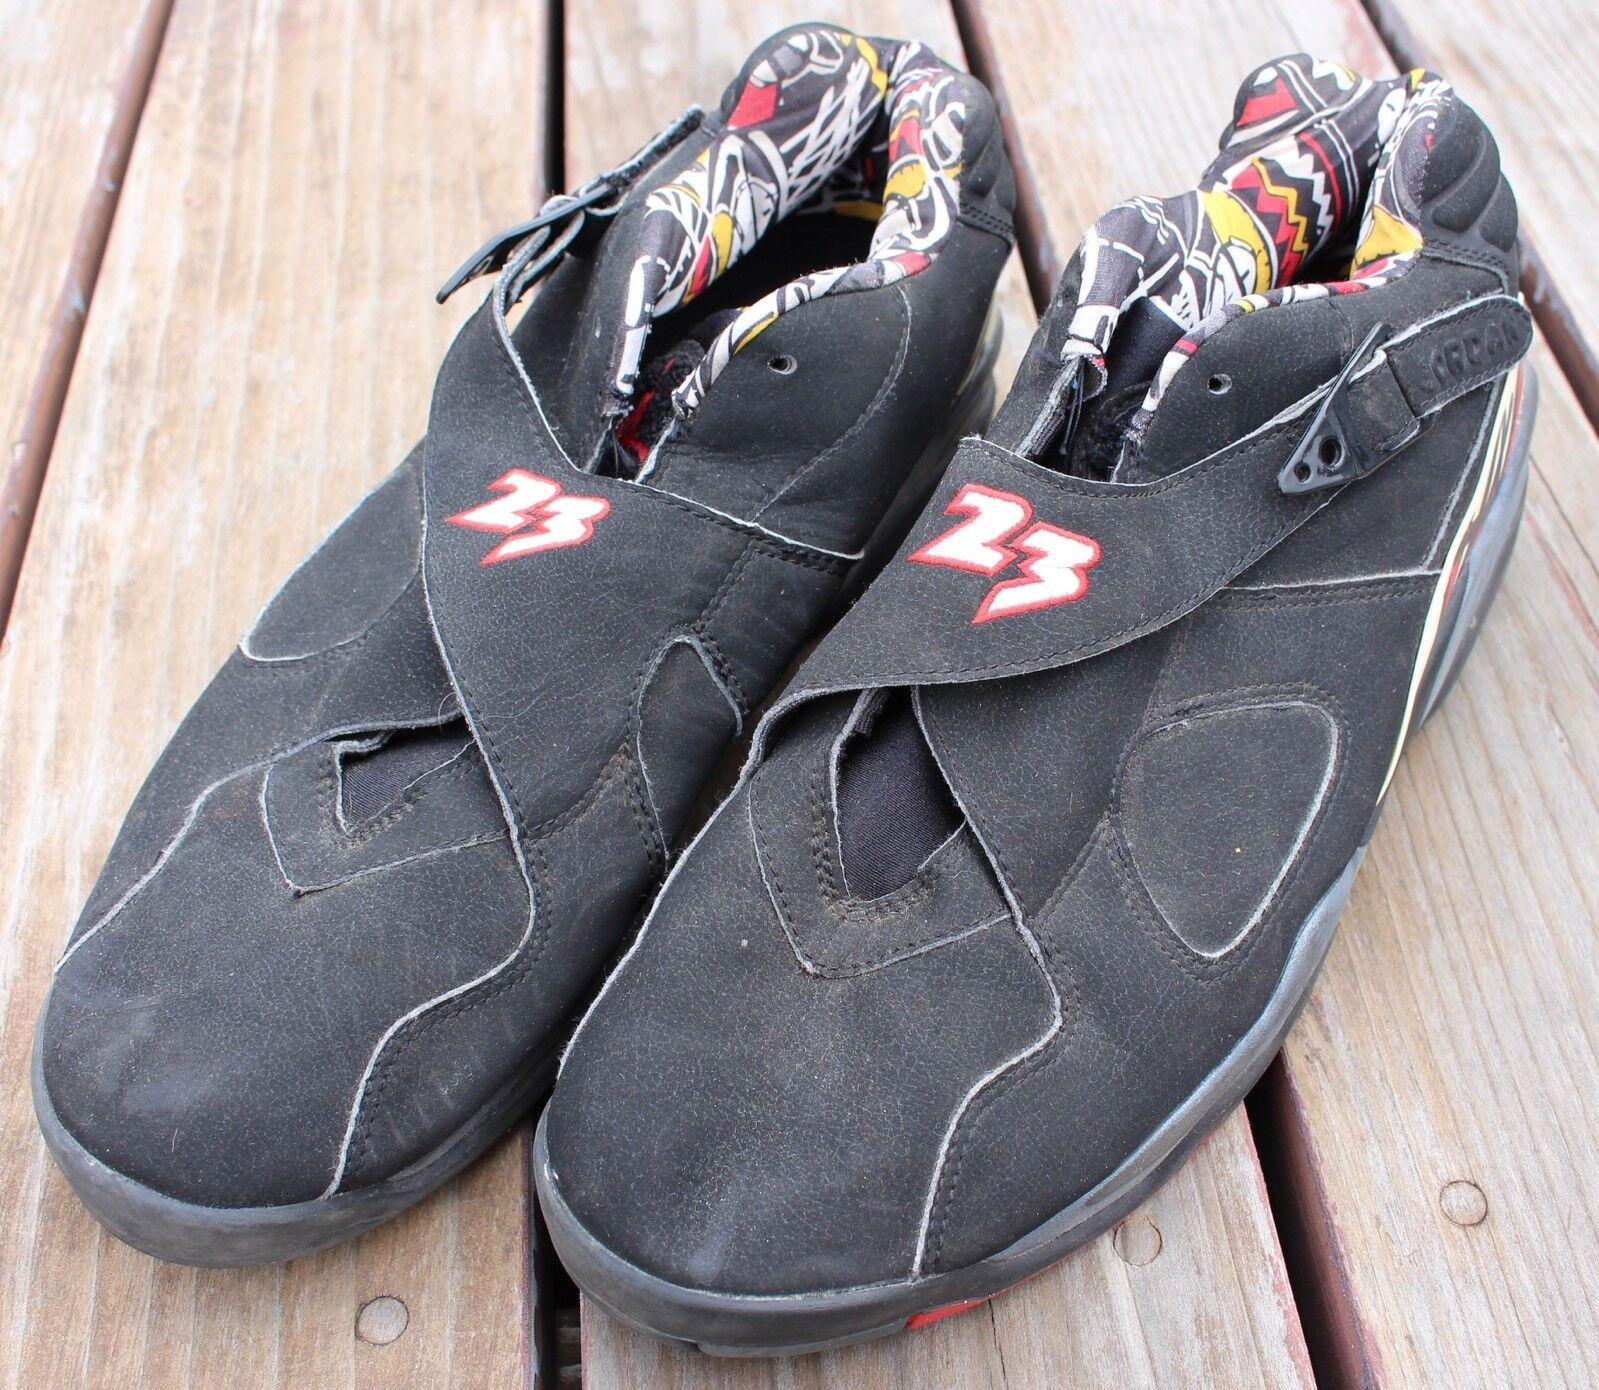 2003 - nike air jordan 8 viii basso playoff rosso misura 13 retrò scarpe 03